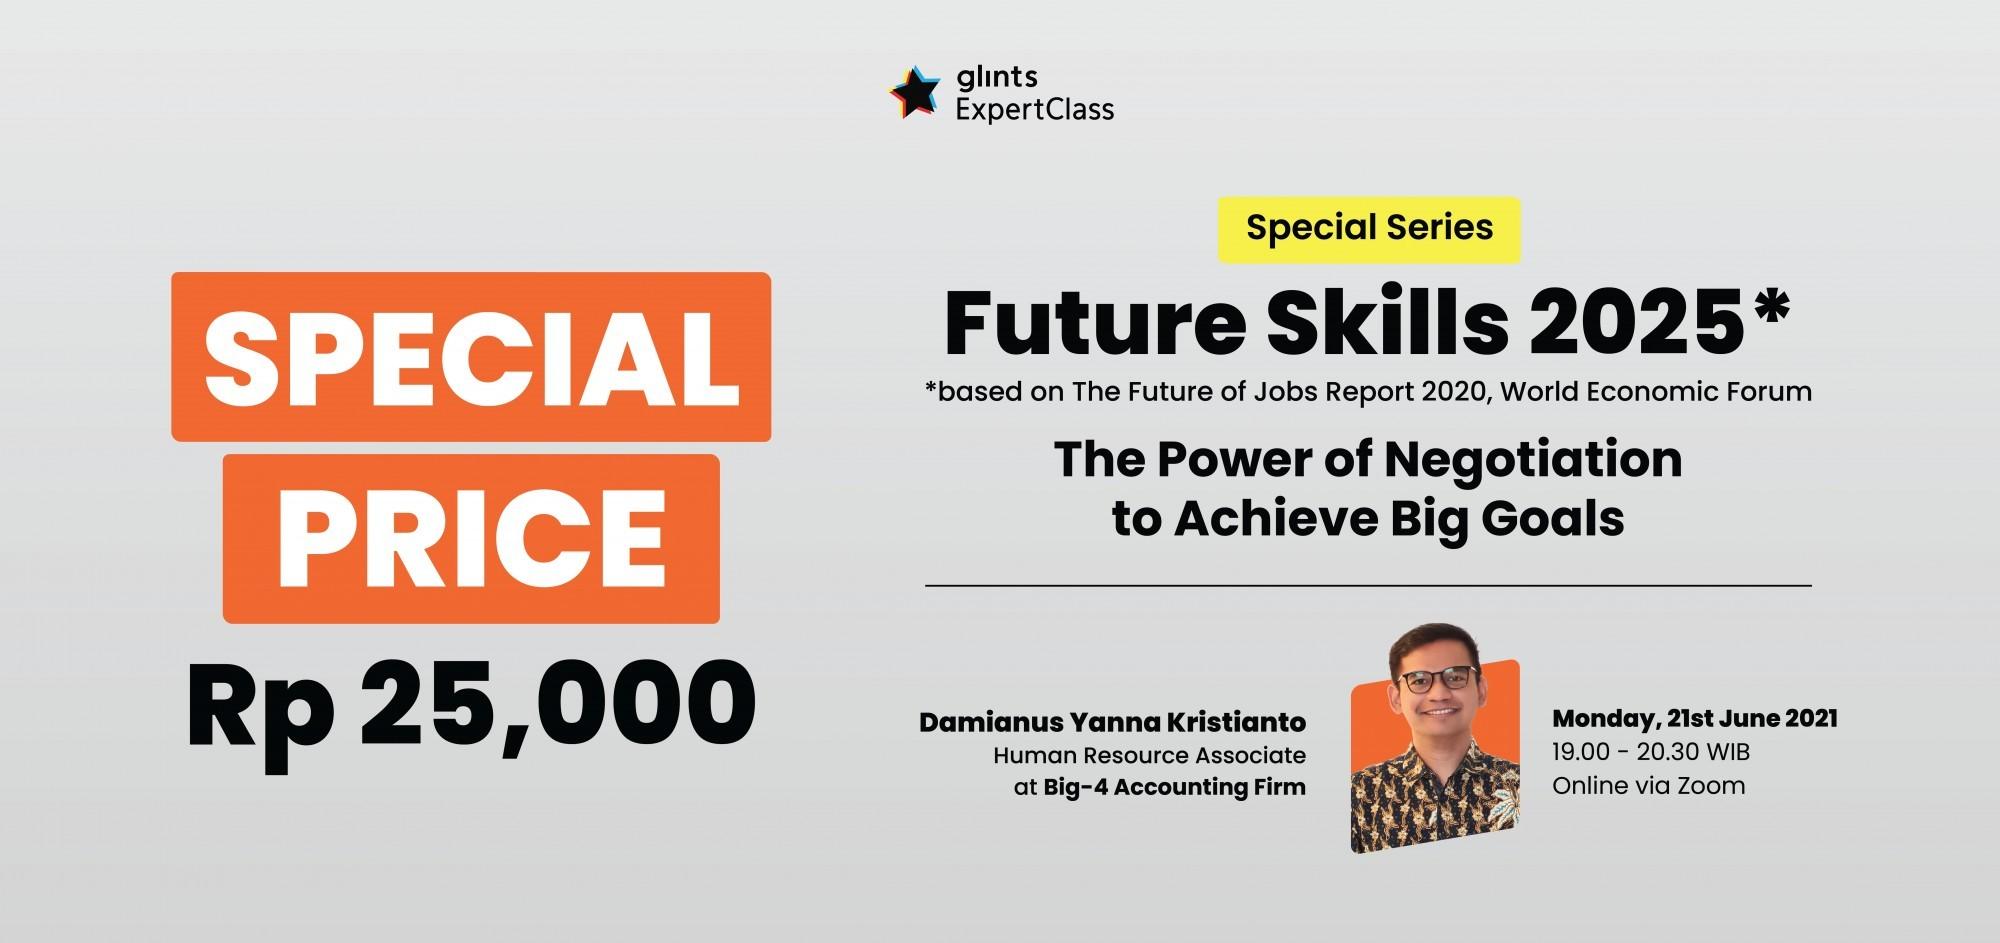 [Future Skills 2025] The Power of Negotiation to Achieve Big Goals